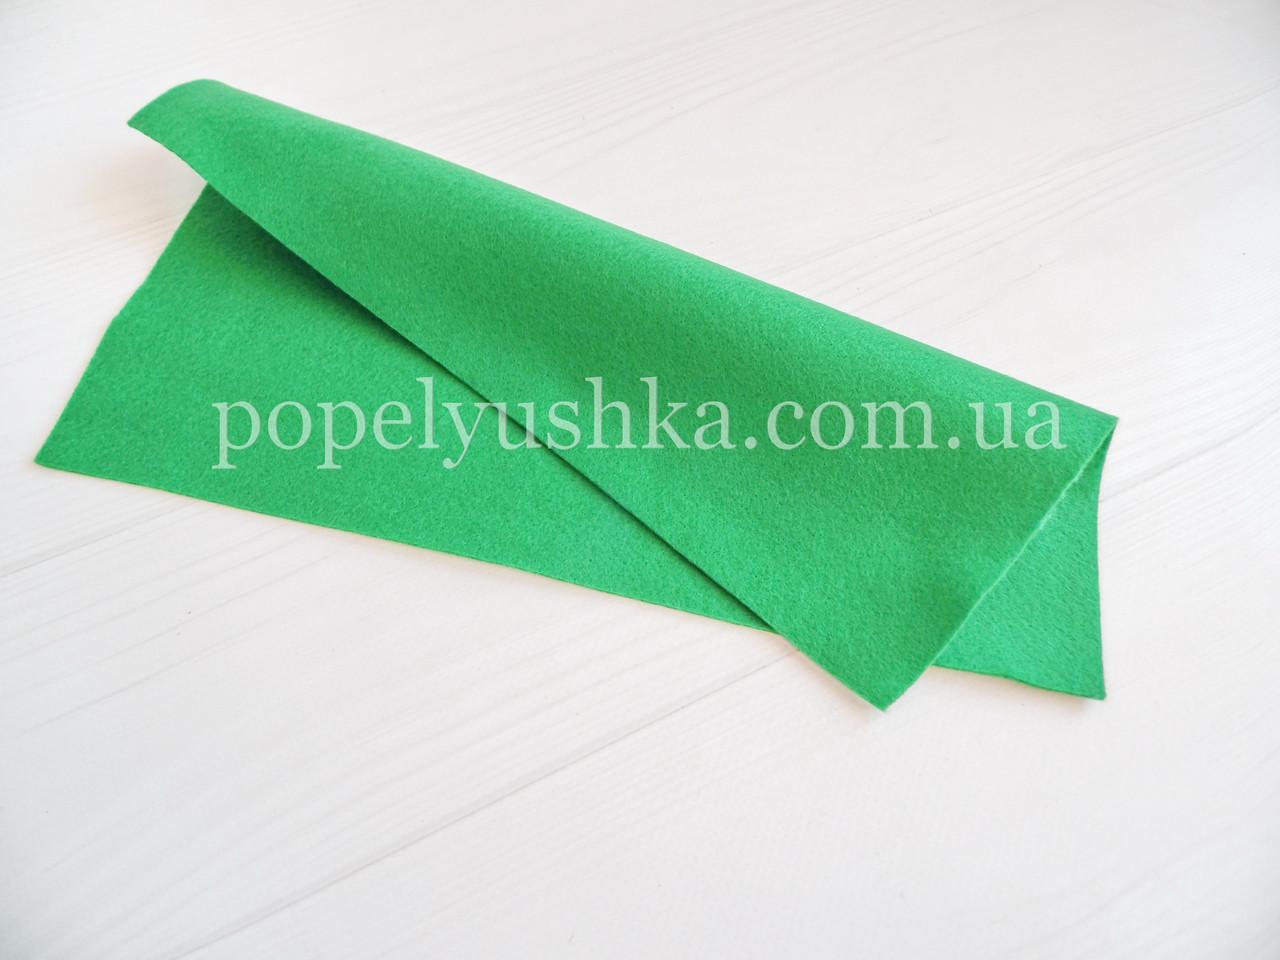 Фетр 1.3 мм китайский мягкий зеленый 20 * 30 см